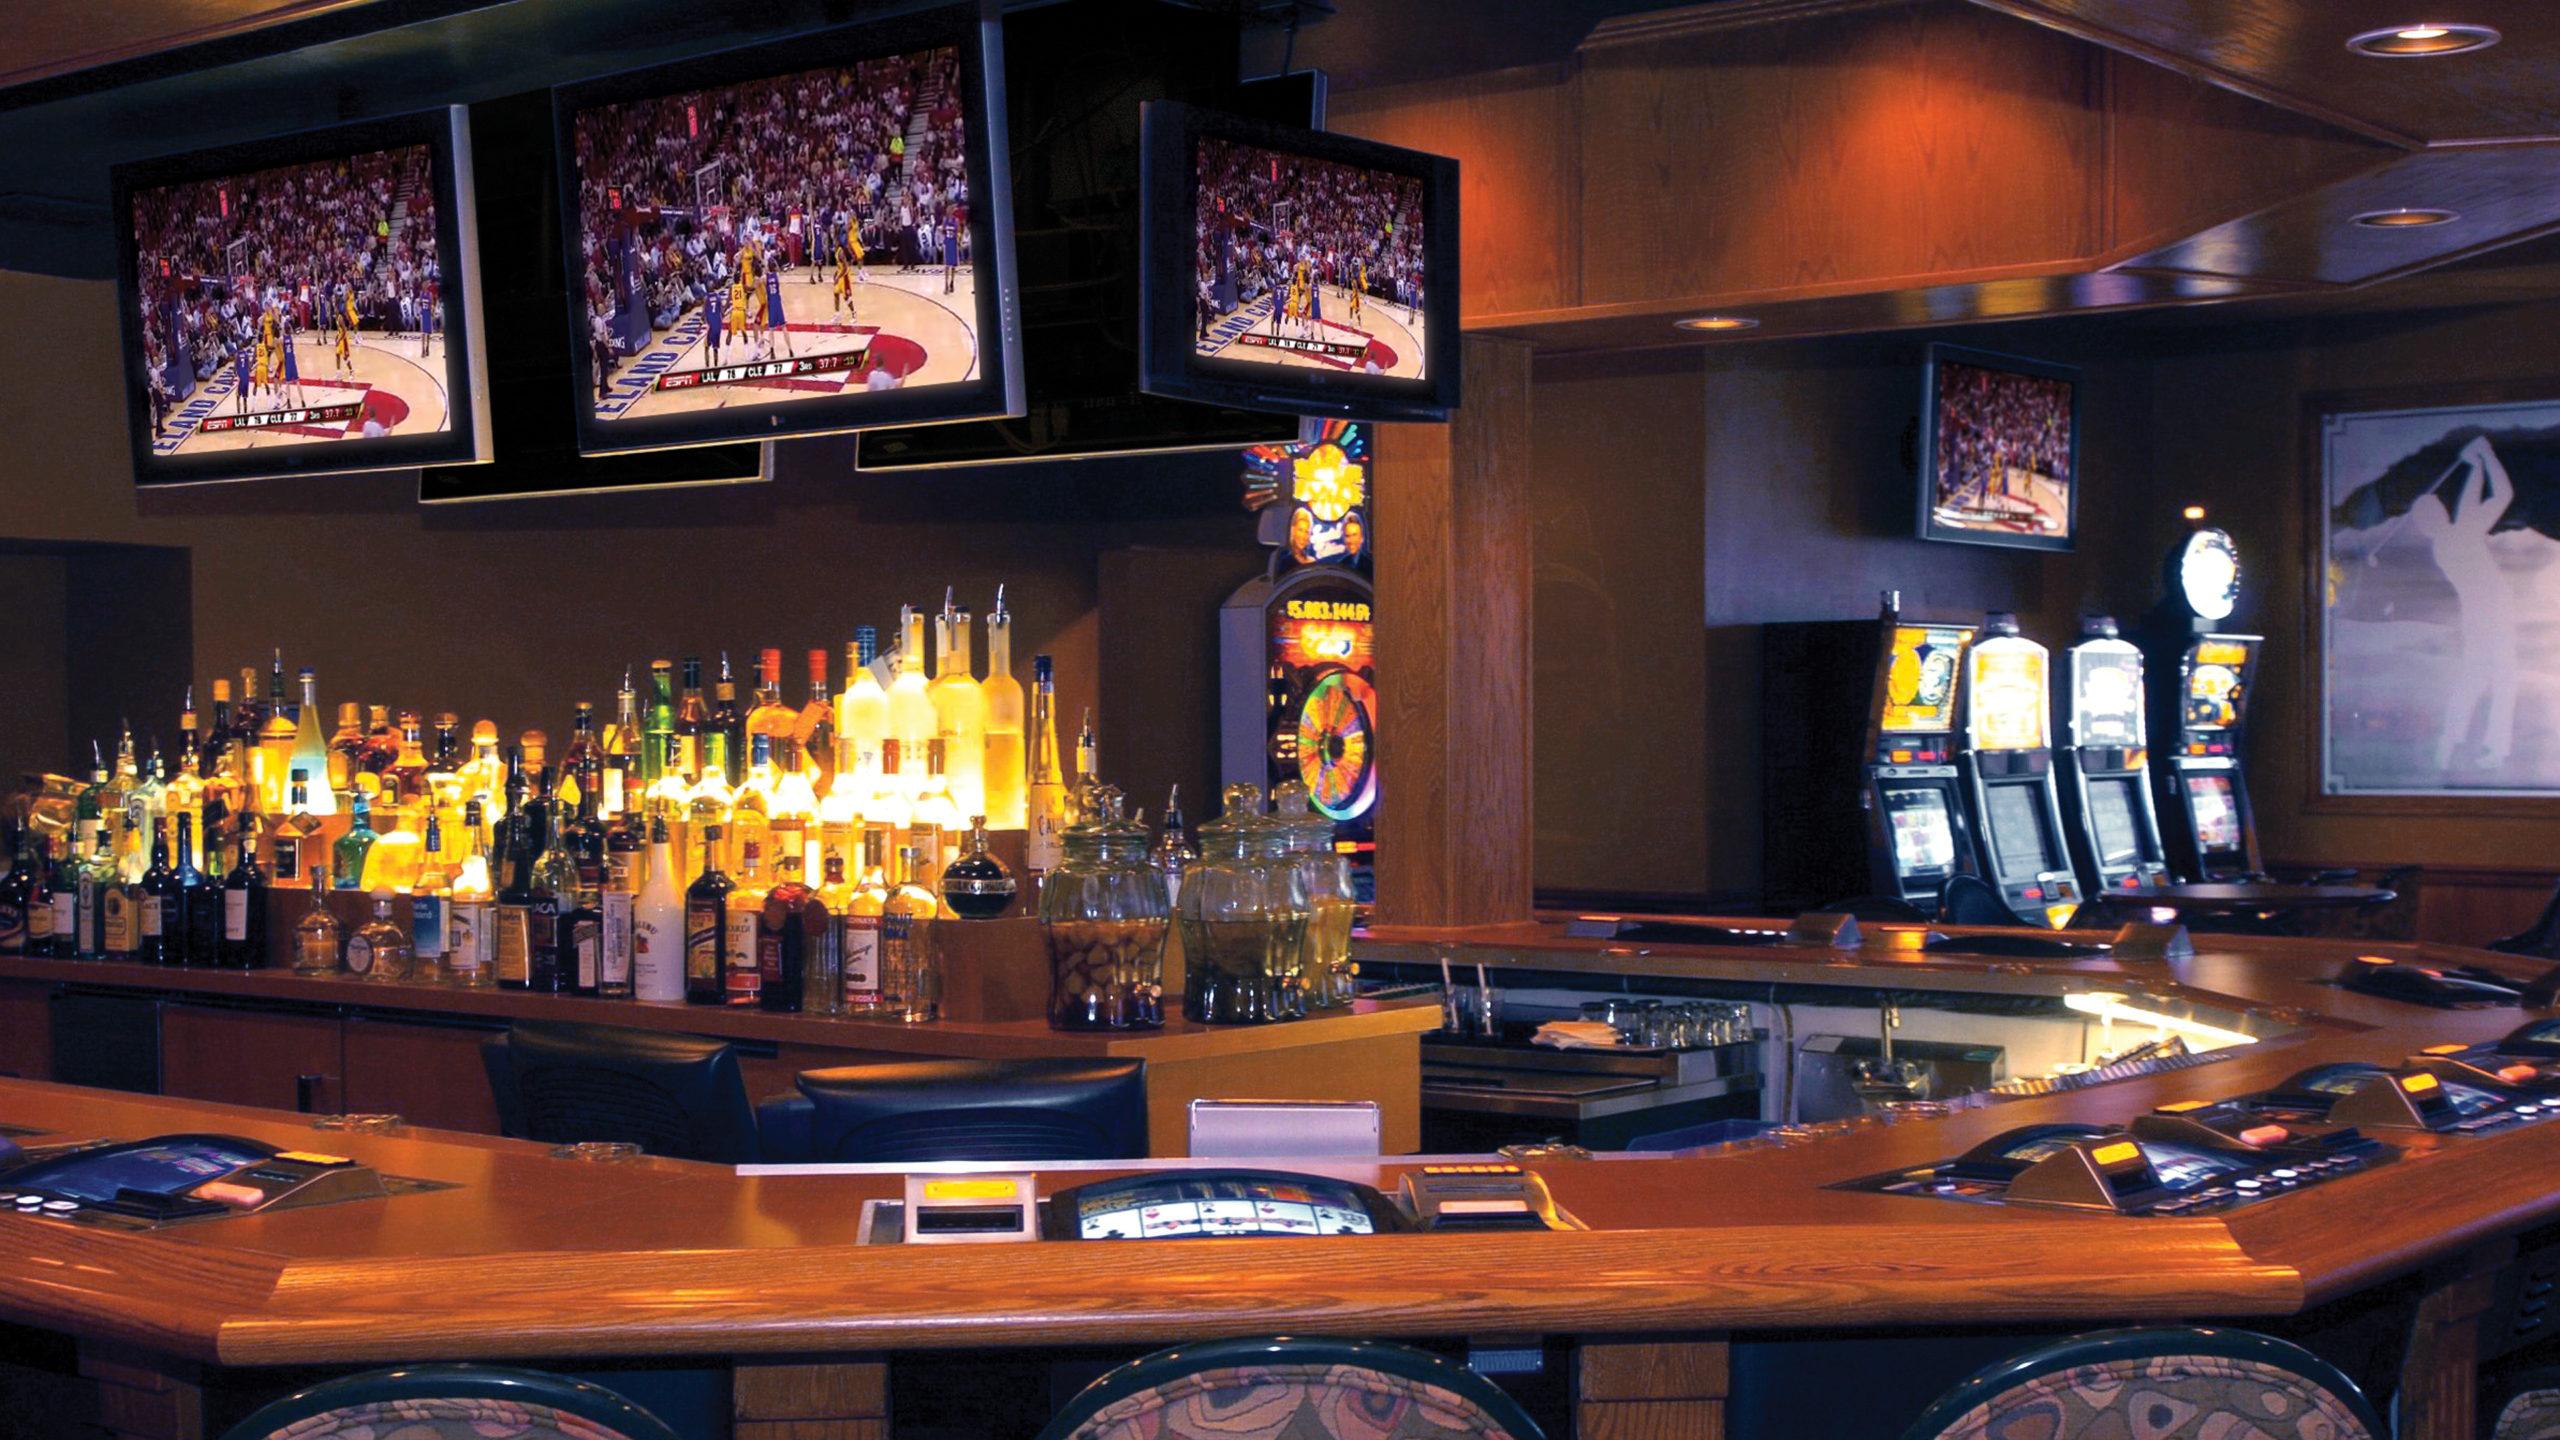 The Greens Bar